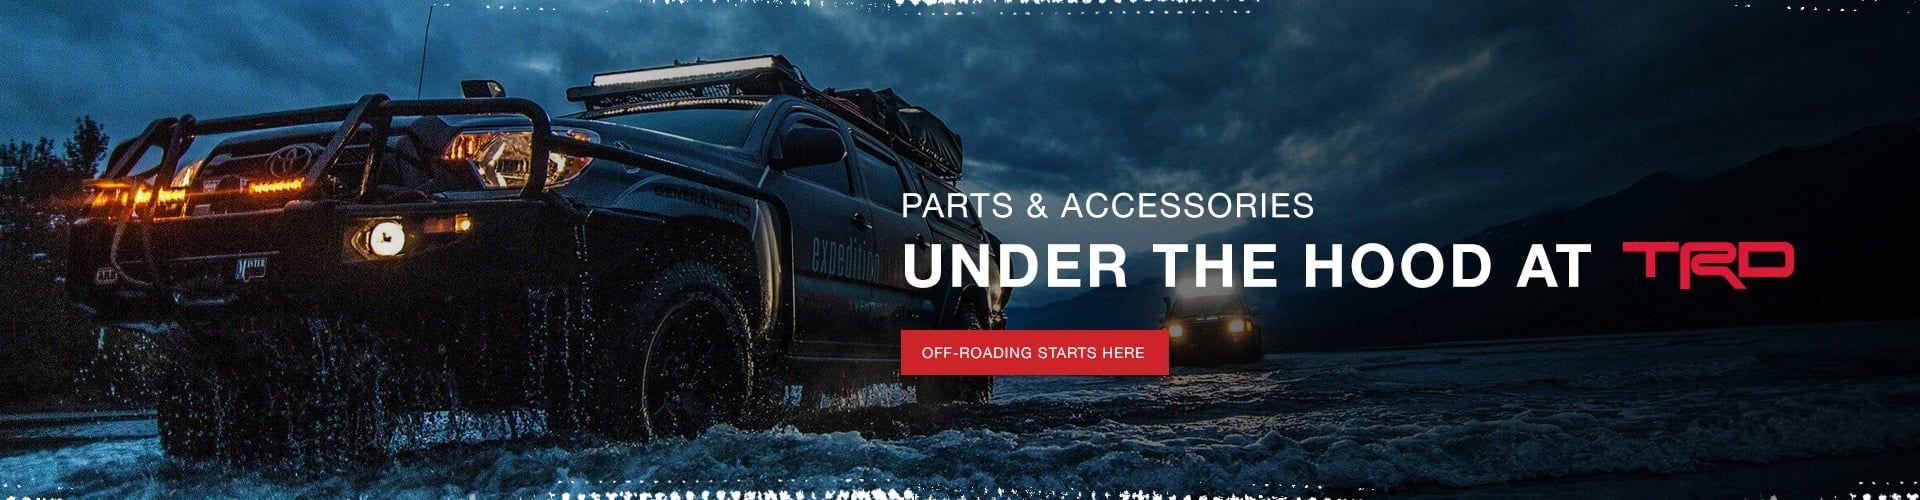 TRD Parts & Accessories